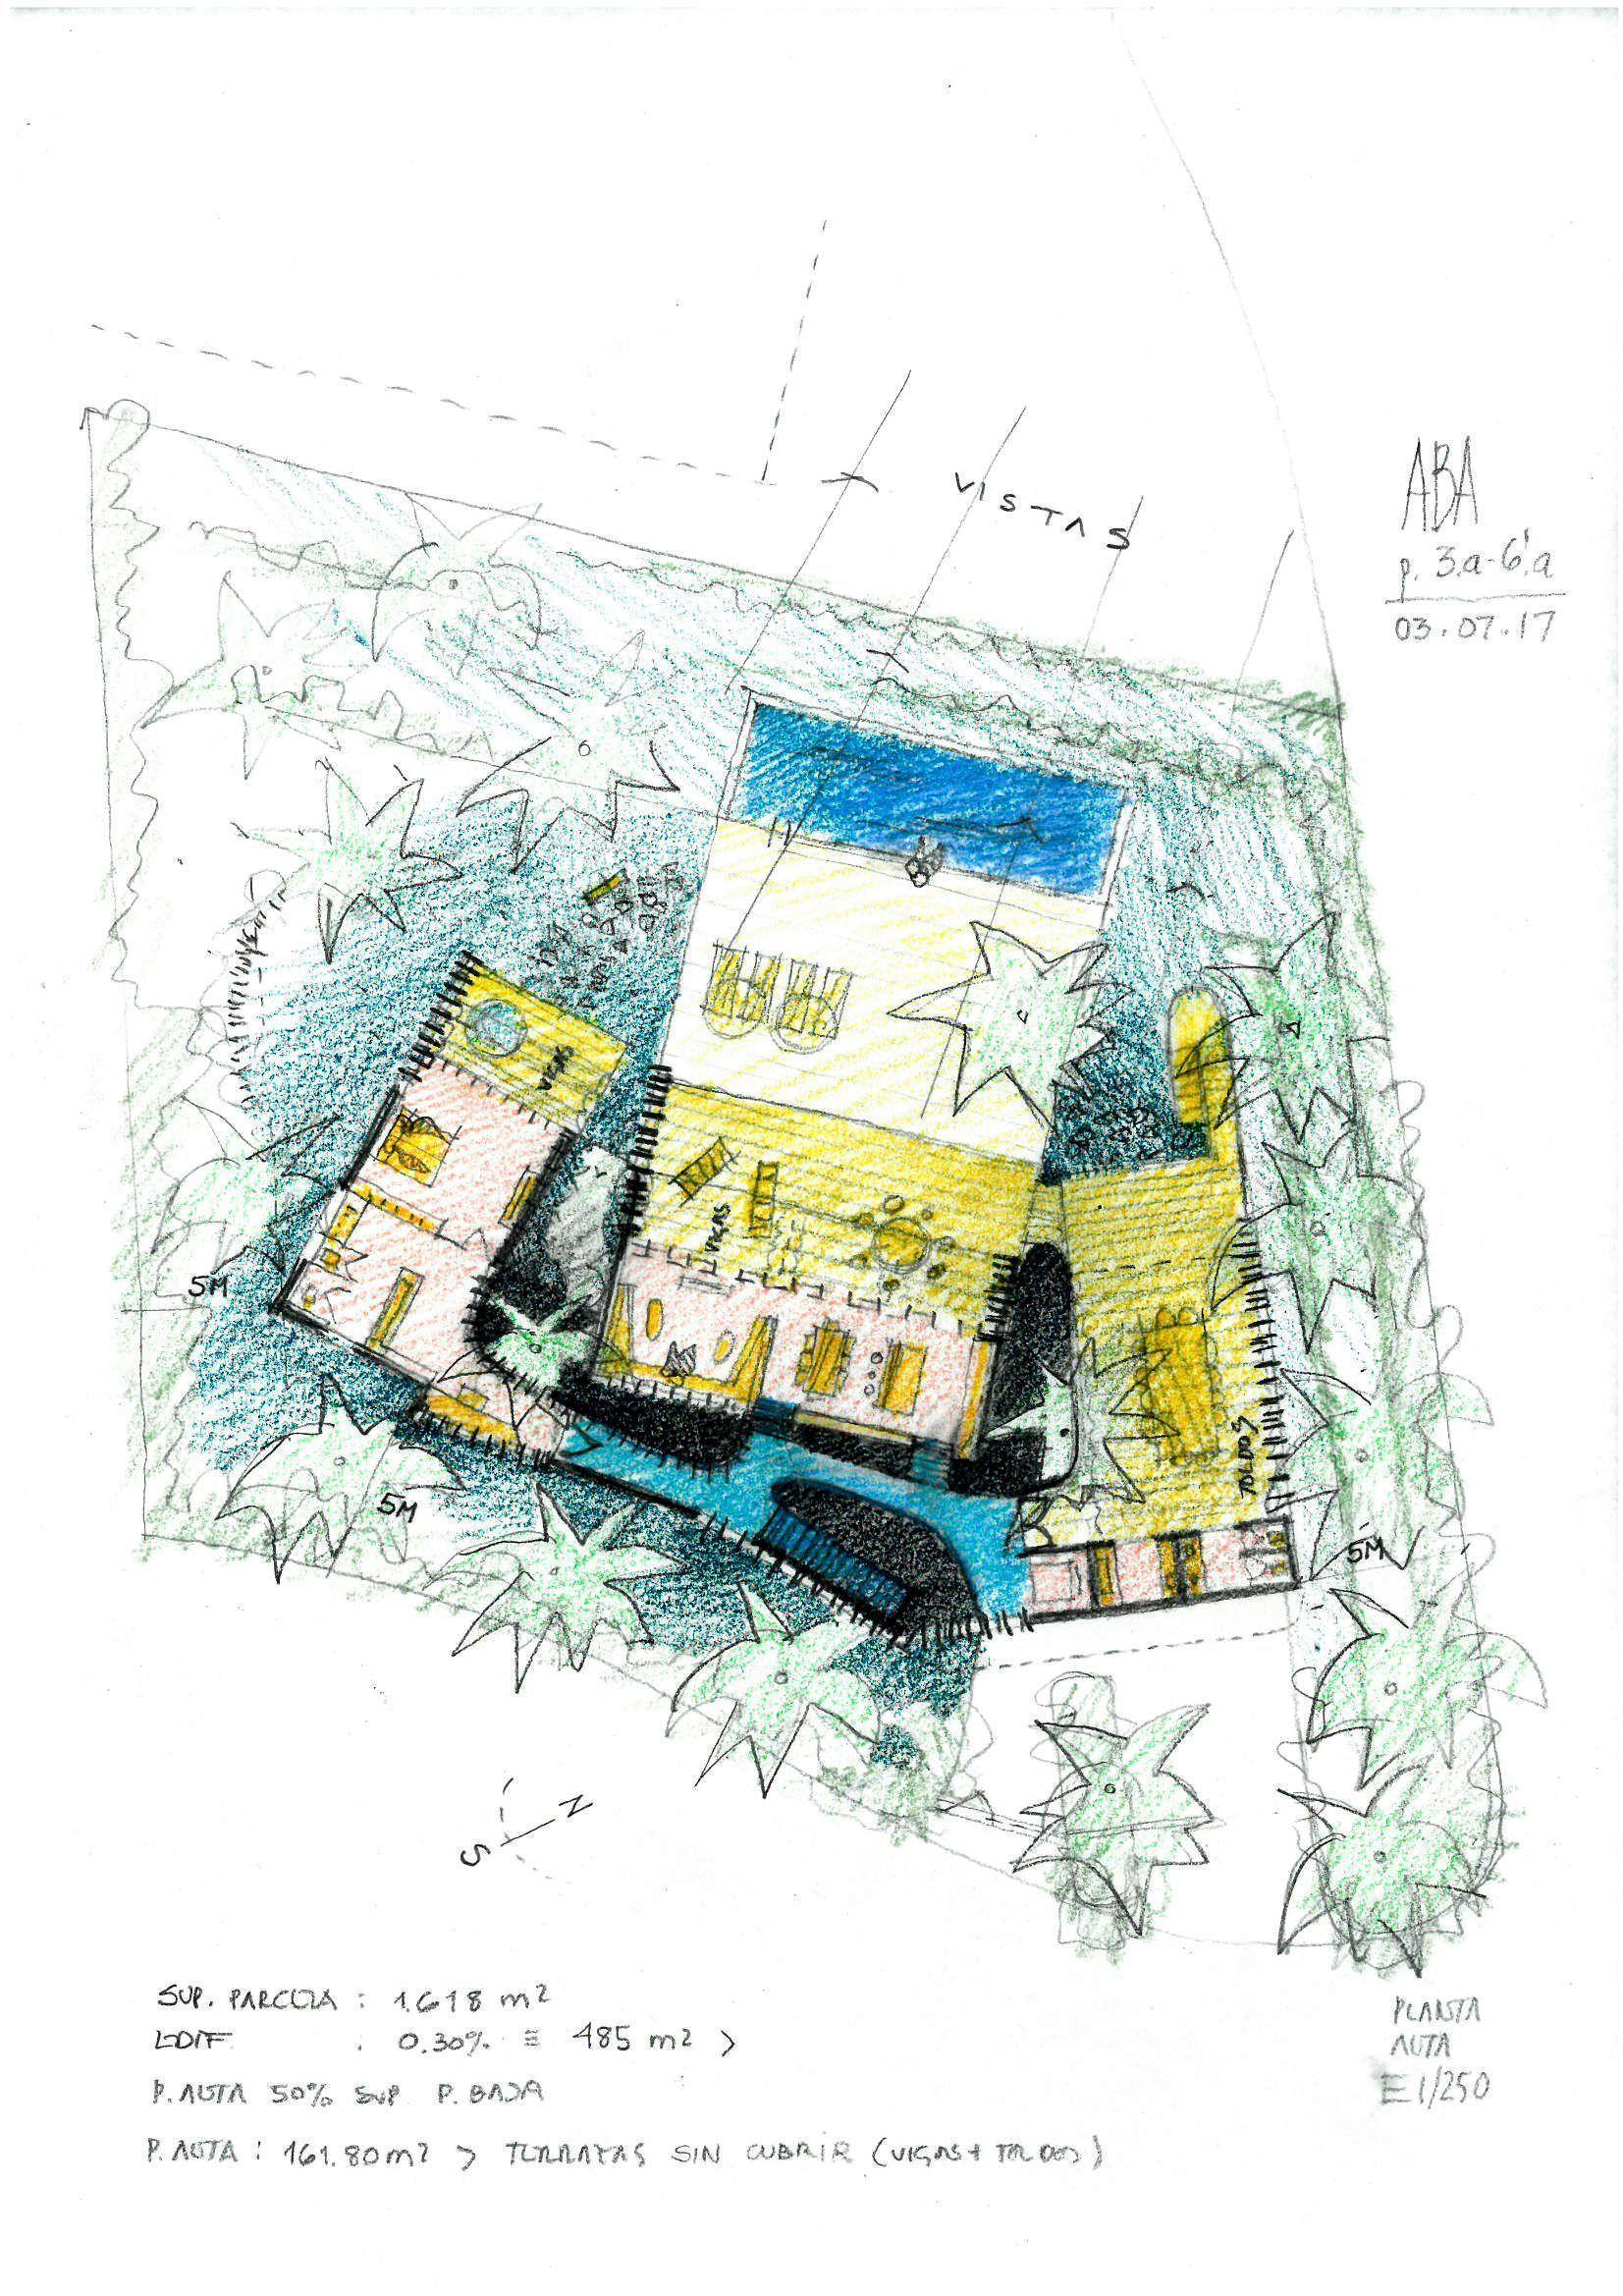 11-2 Casa fragmentada, nómada del paisaje atlántico